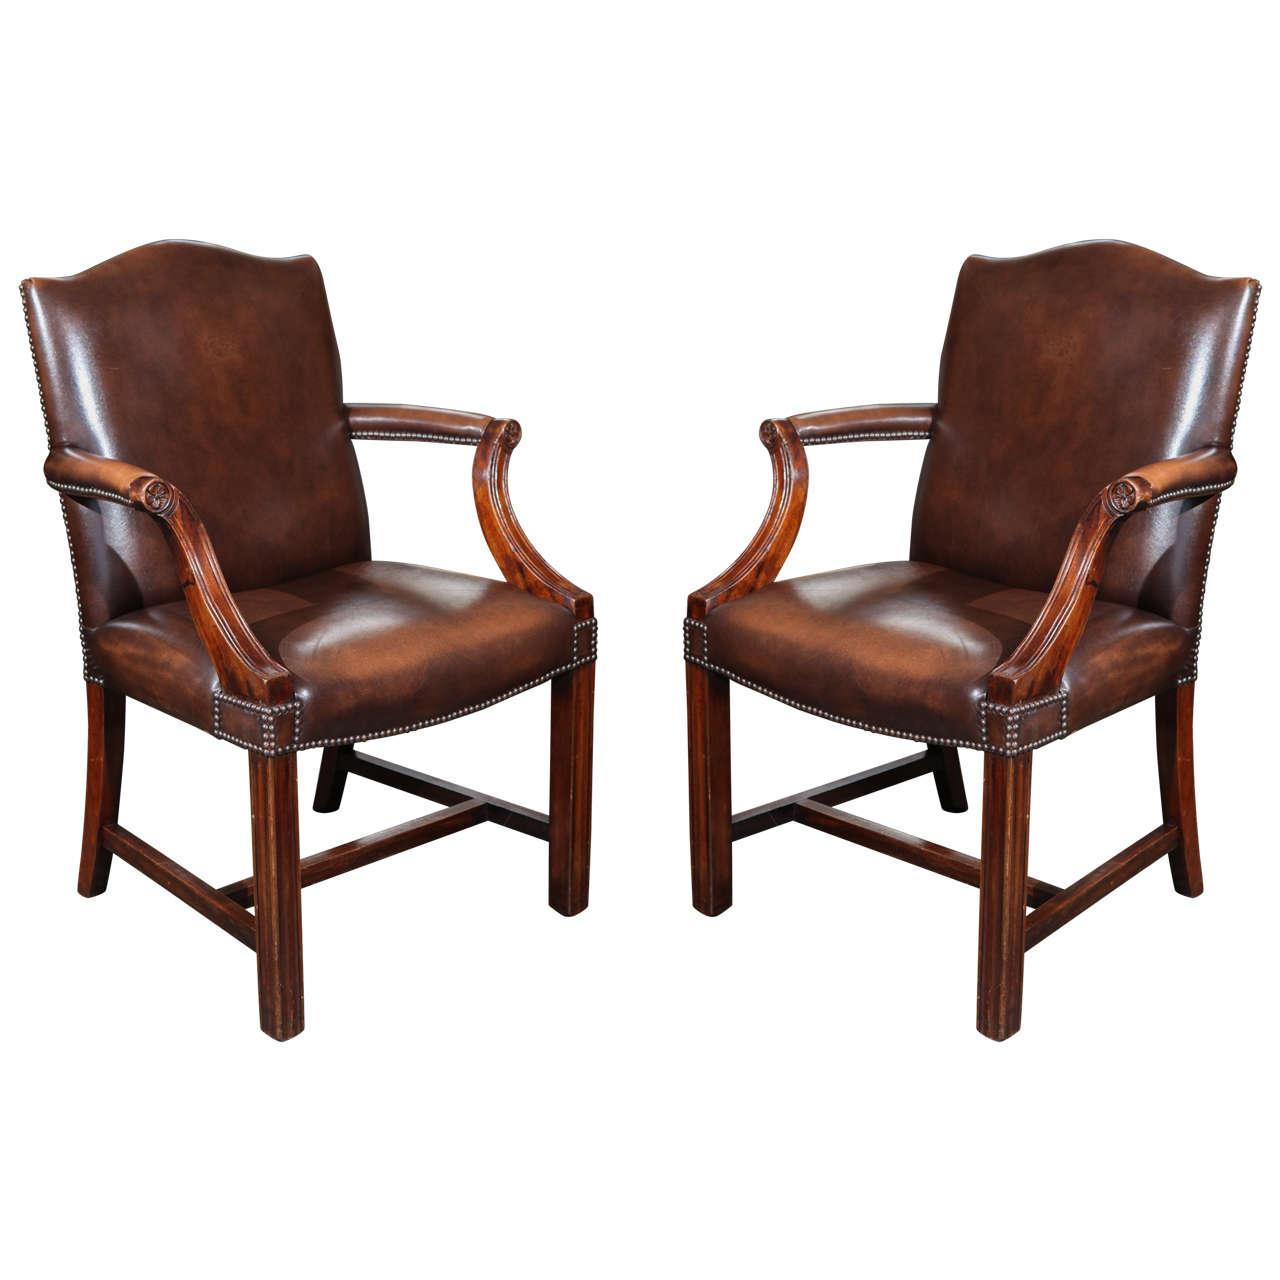 Pair of Georgian Revival Gainsborough Armchairs